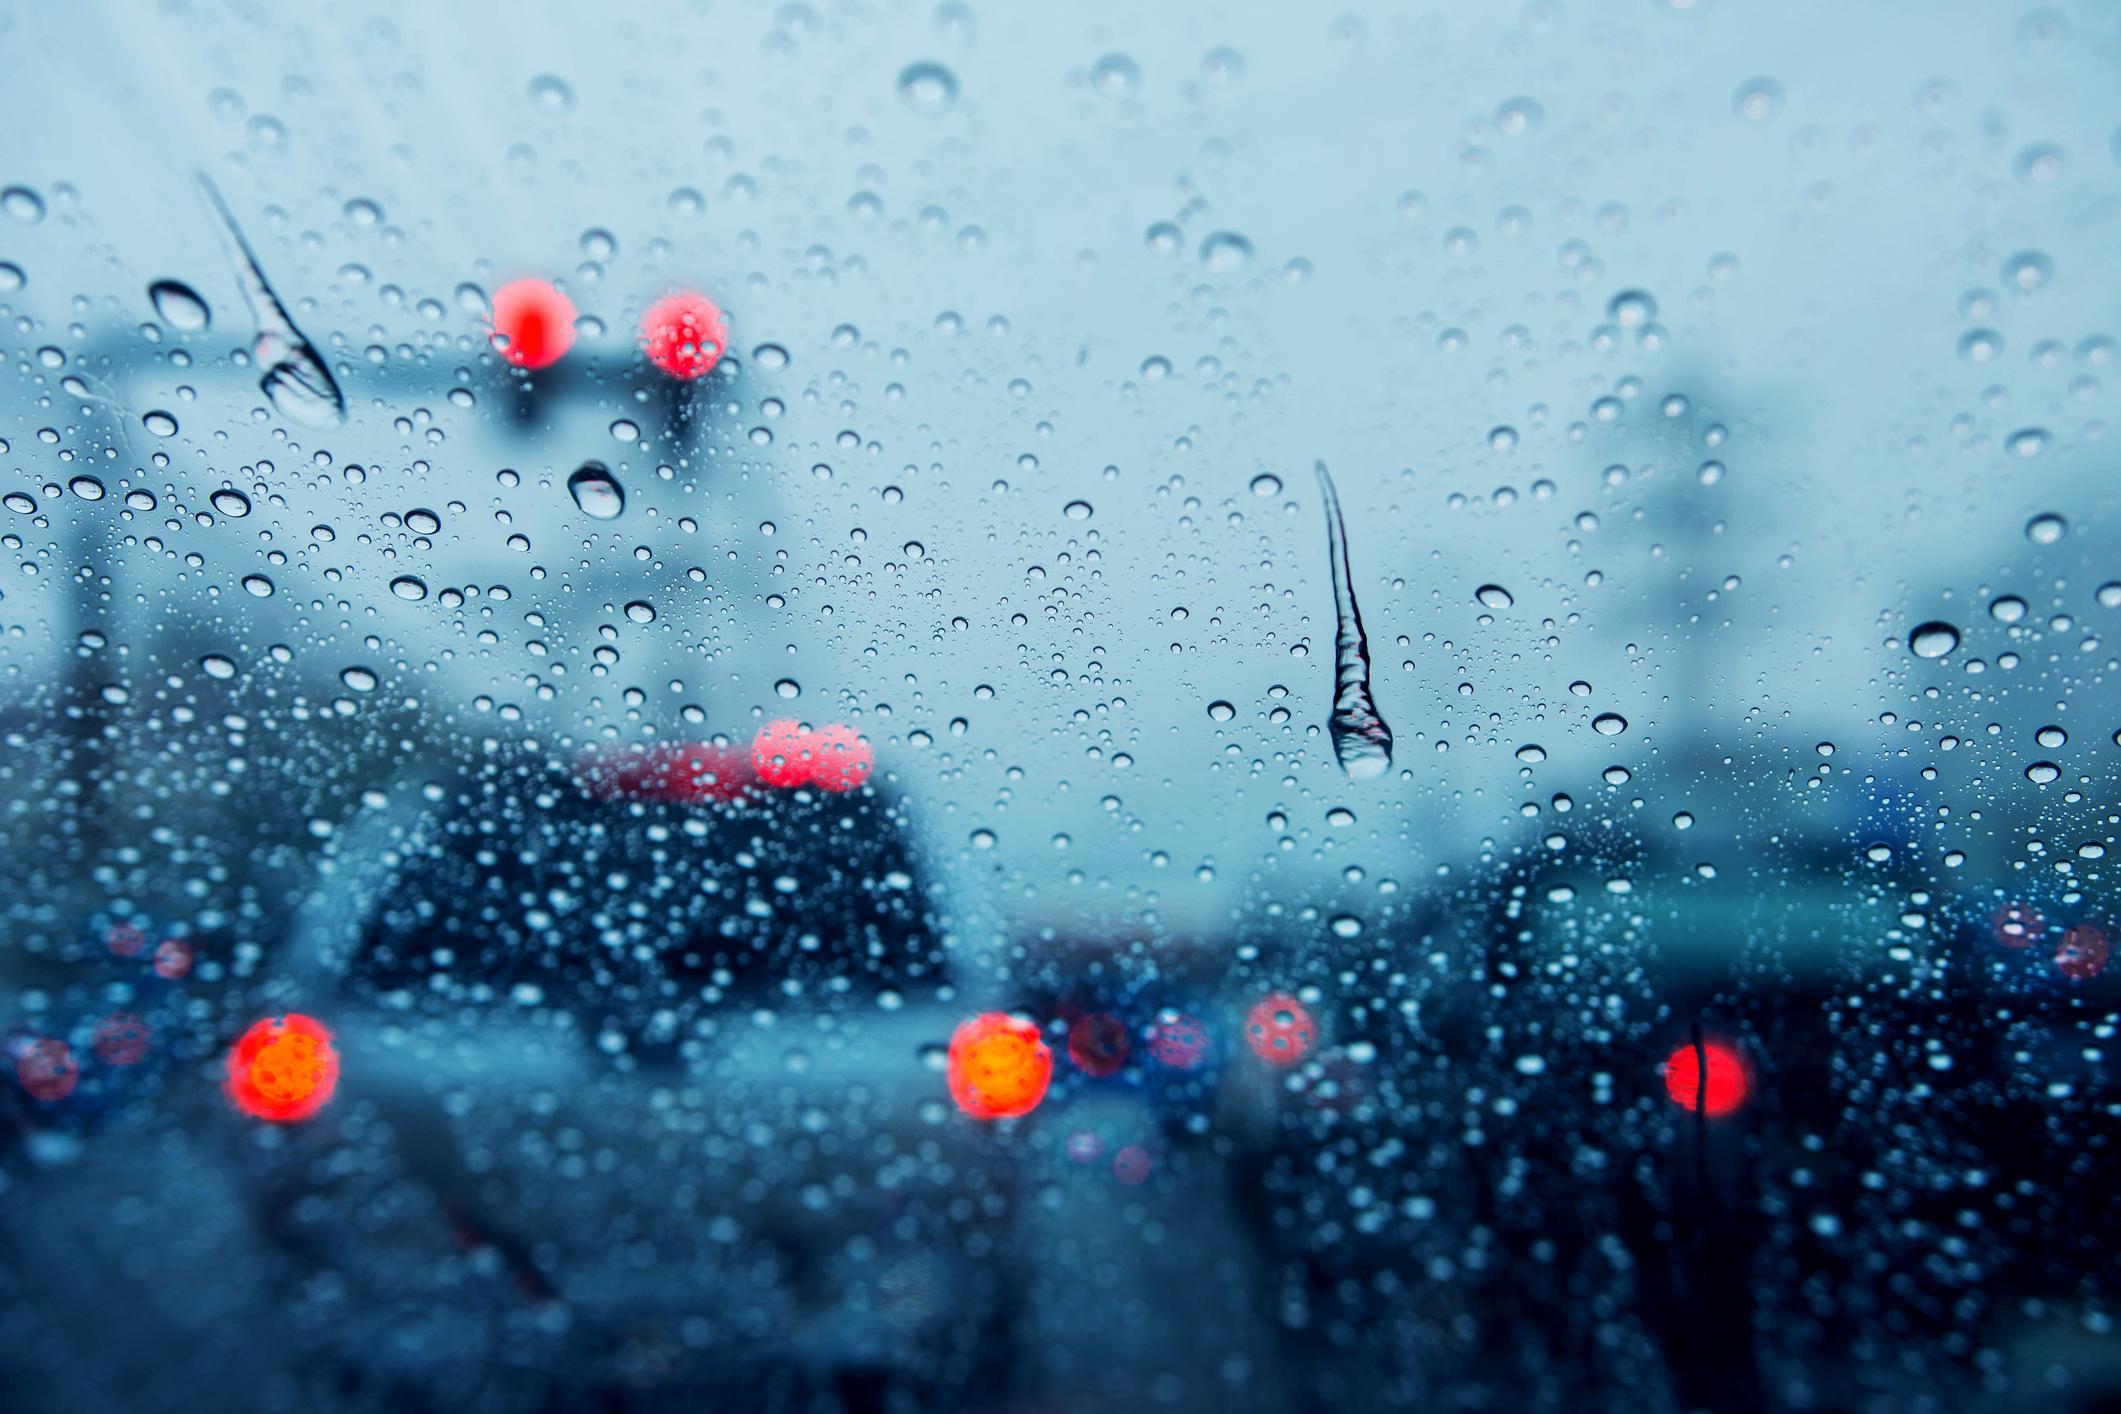 dirigir na chuva